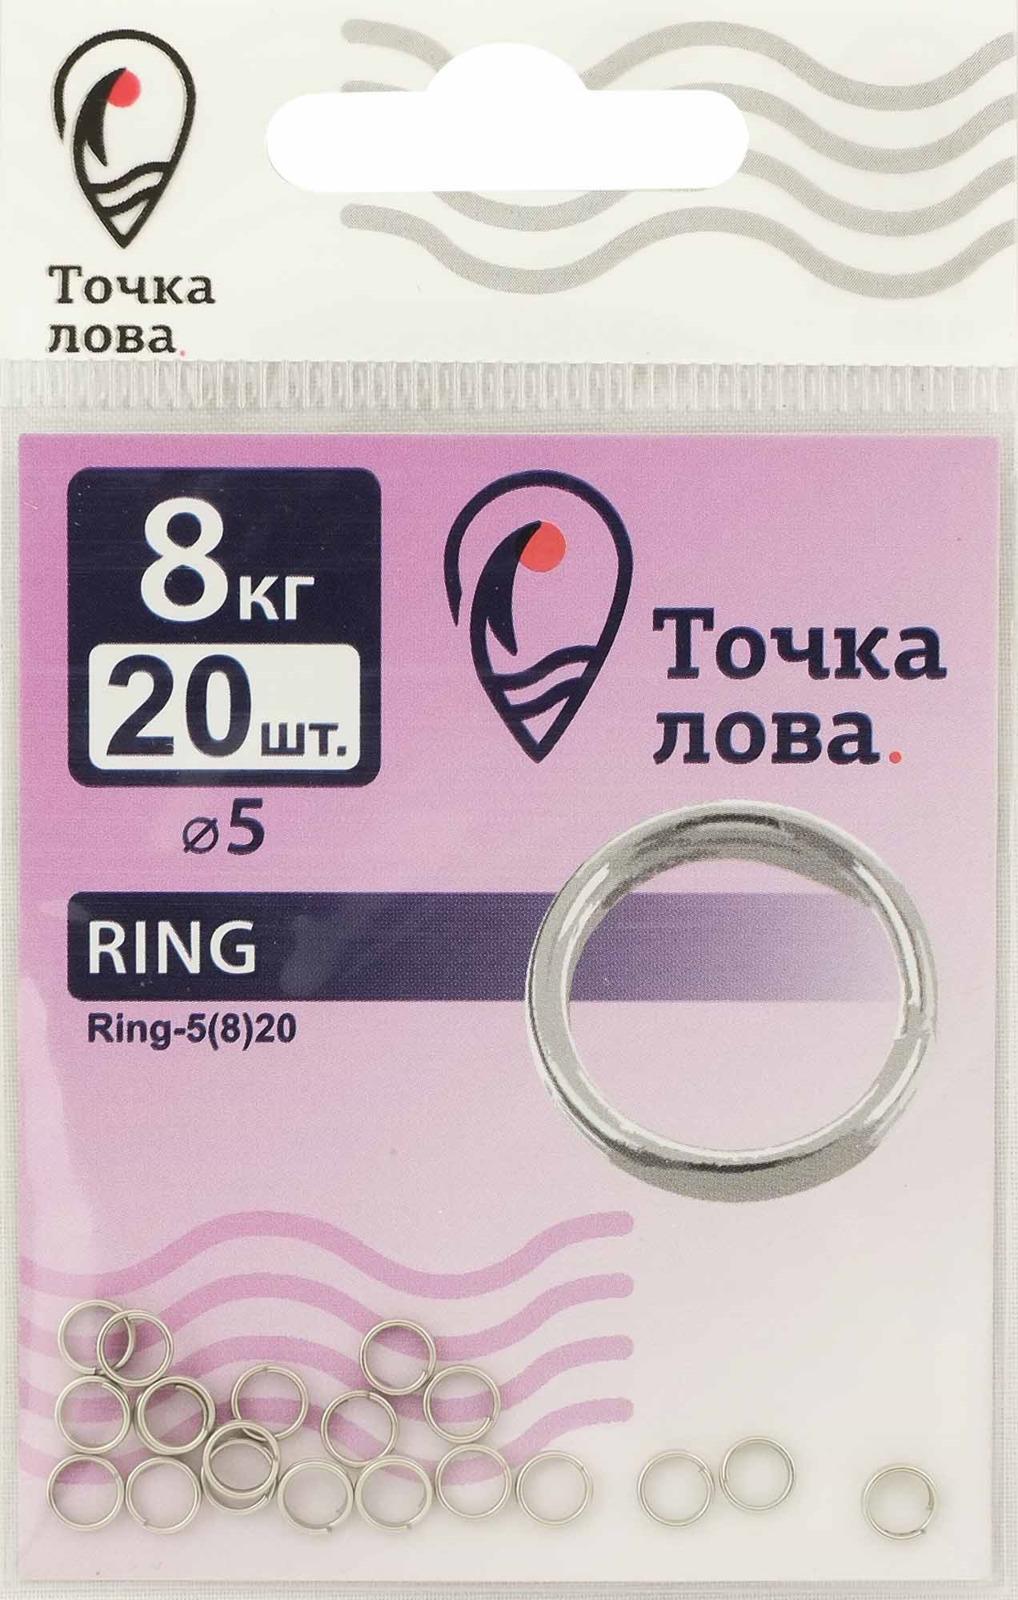 Аксессуар для рыбалки Точка Лова Заводное кольцо, Ring-5(8), 20 шт кольцо три кита заводное d 5 уп 20шт тест 9 5кг